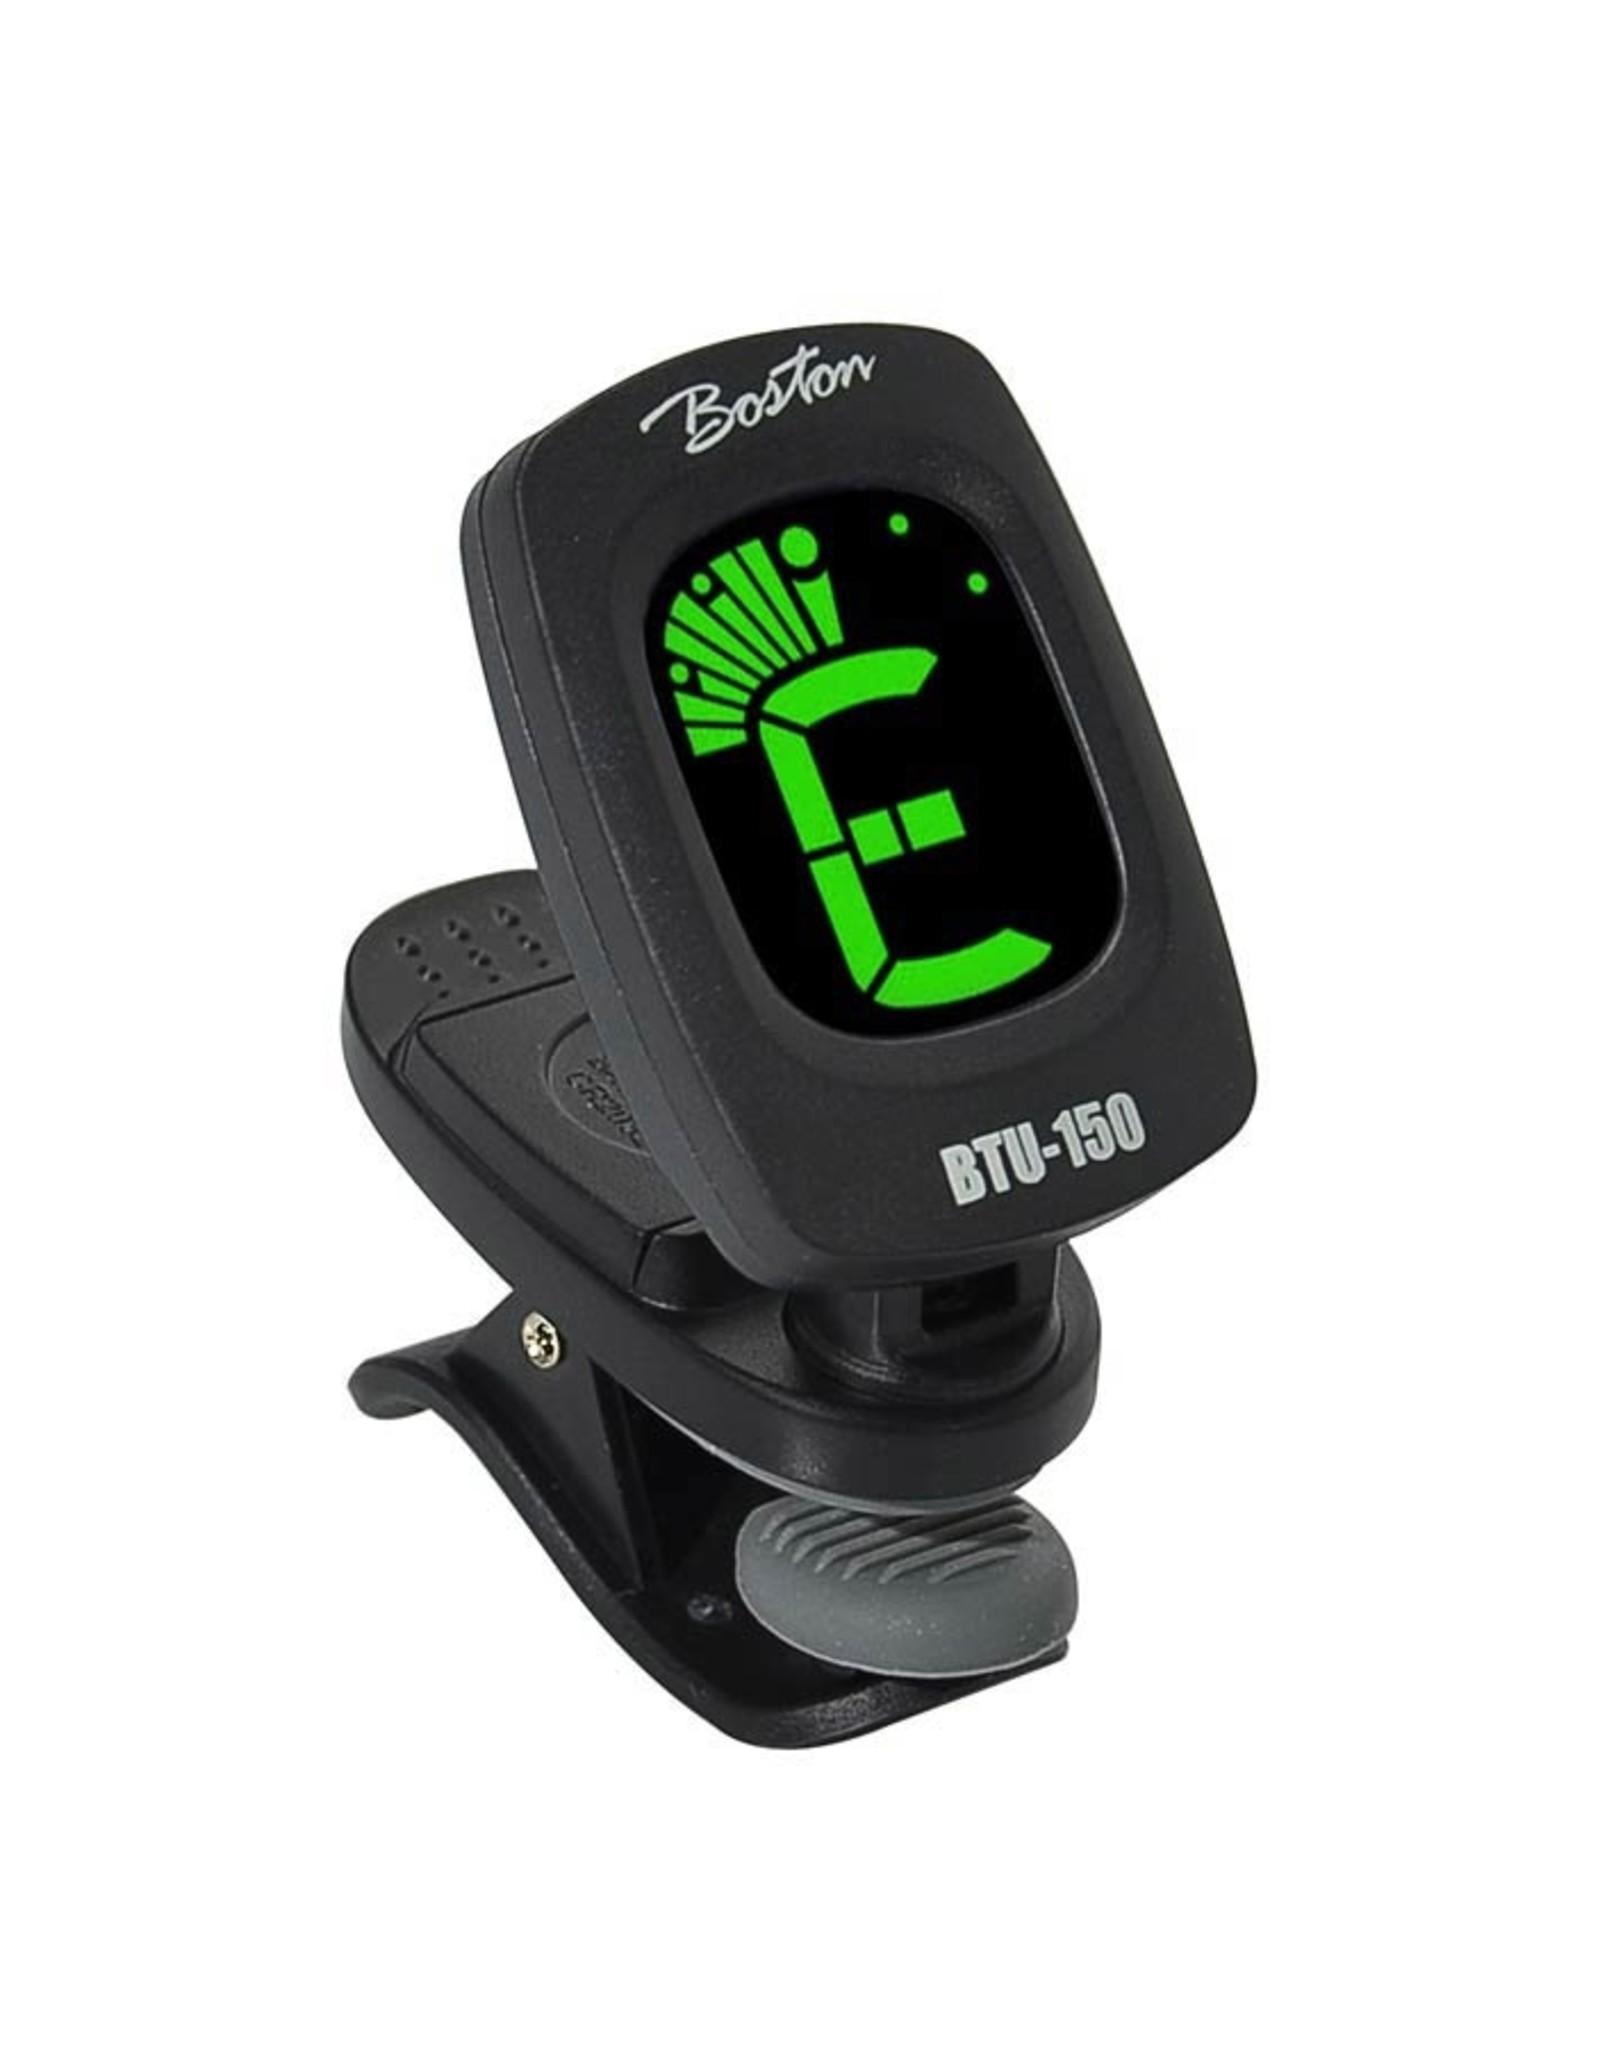 Boston Boston BTU-150 chromatic clip tuner